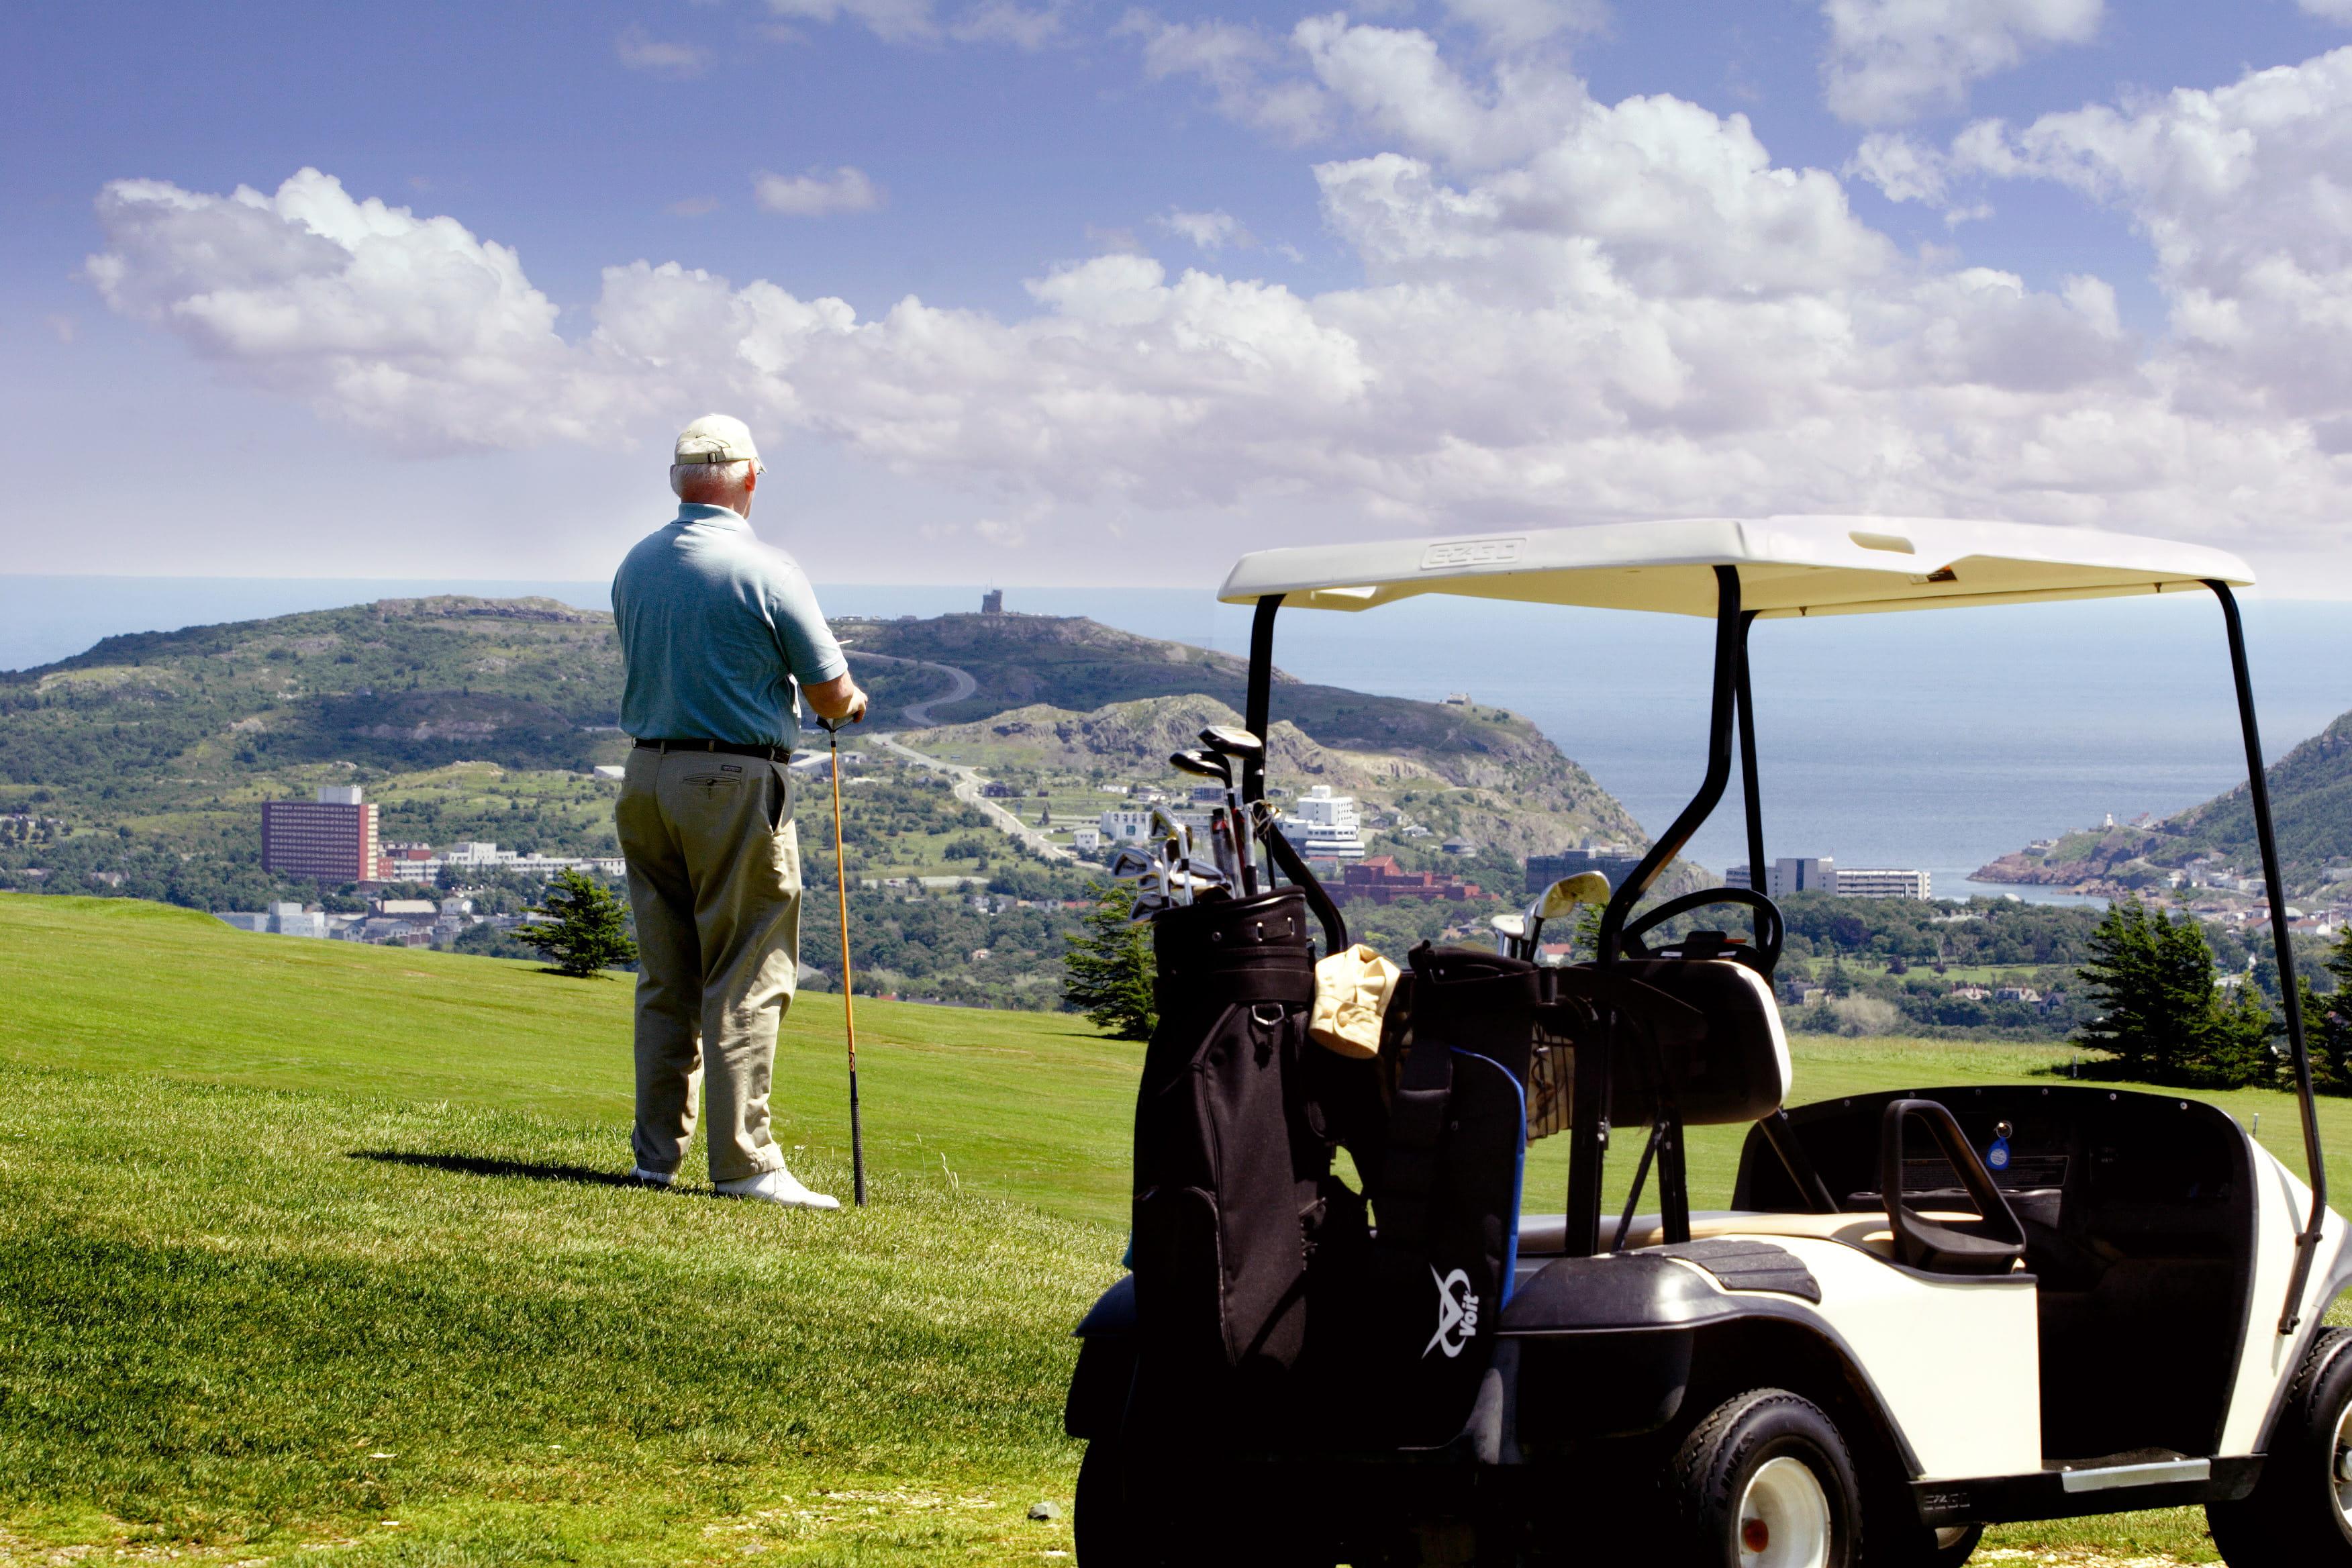 Pippy Park Golf Course